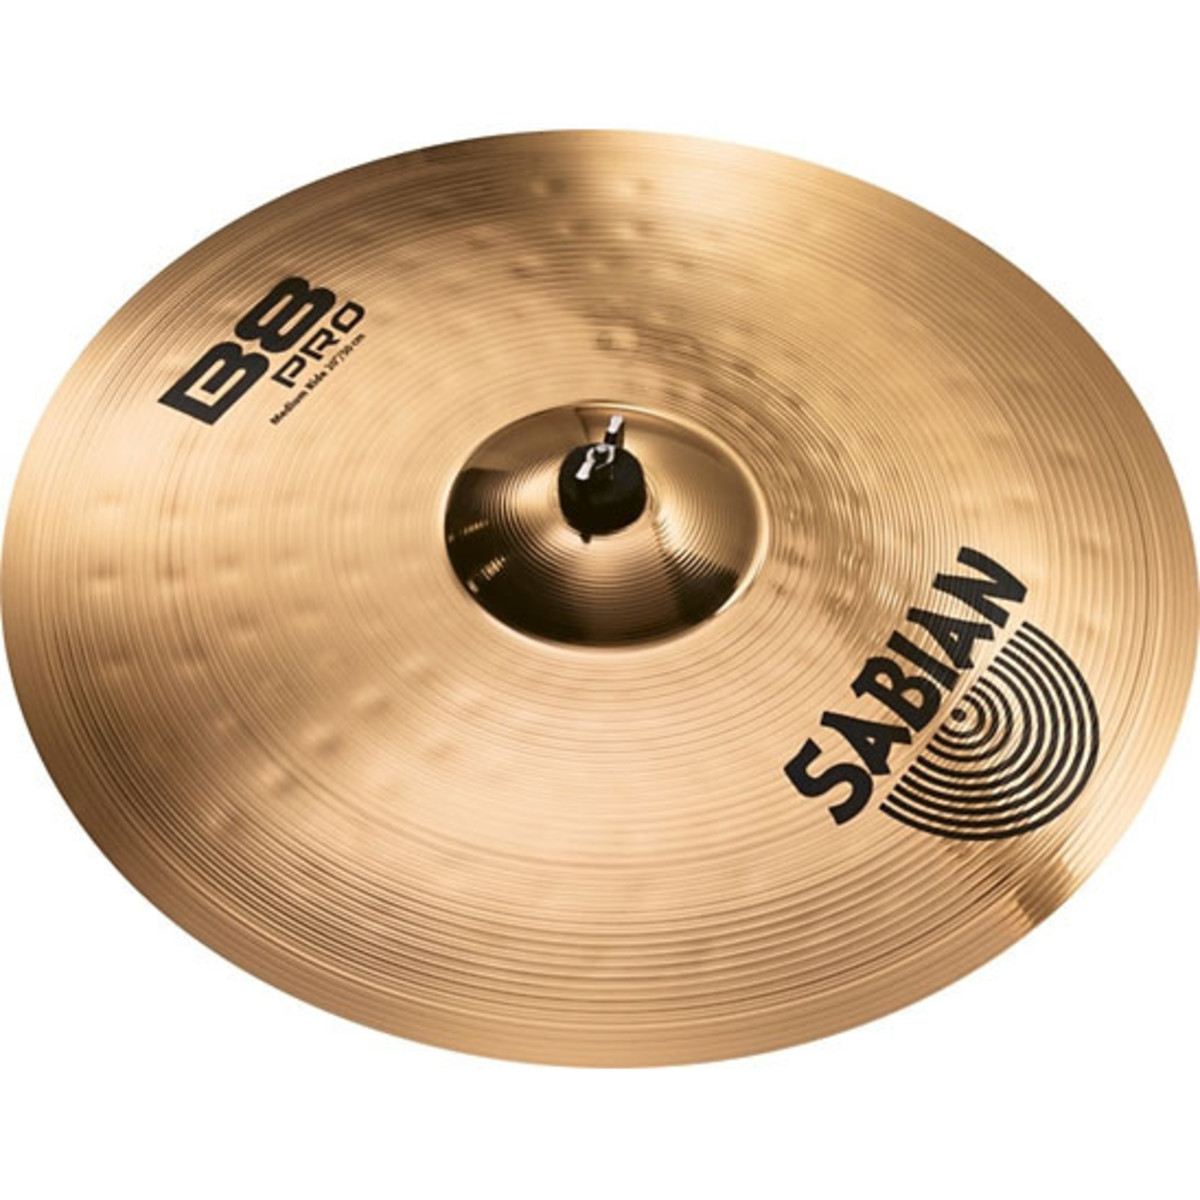 sabian b8 pro 20 39 39 rock ride cymbal at gear4music. Black Bedroom Furniture Sets. Home Design Ideas